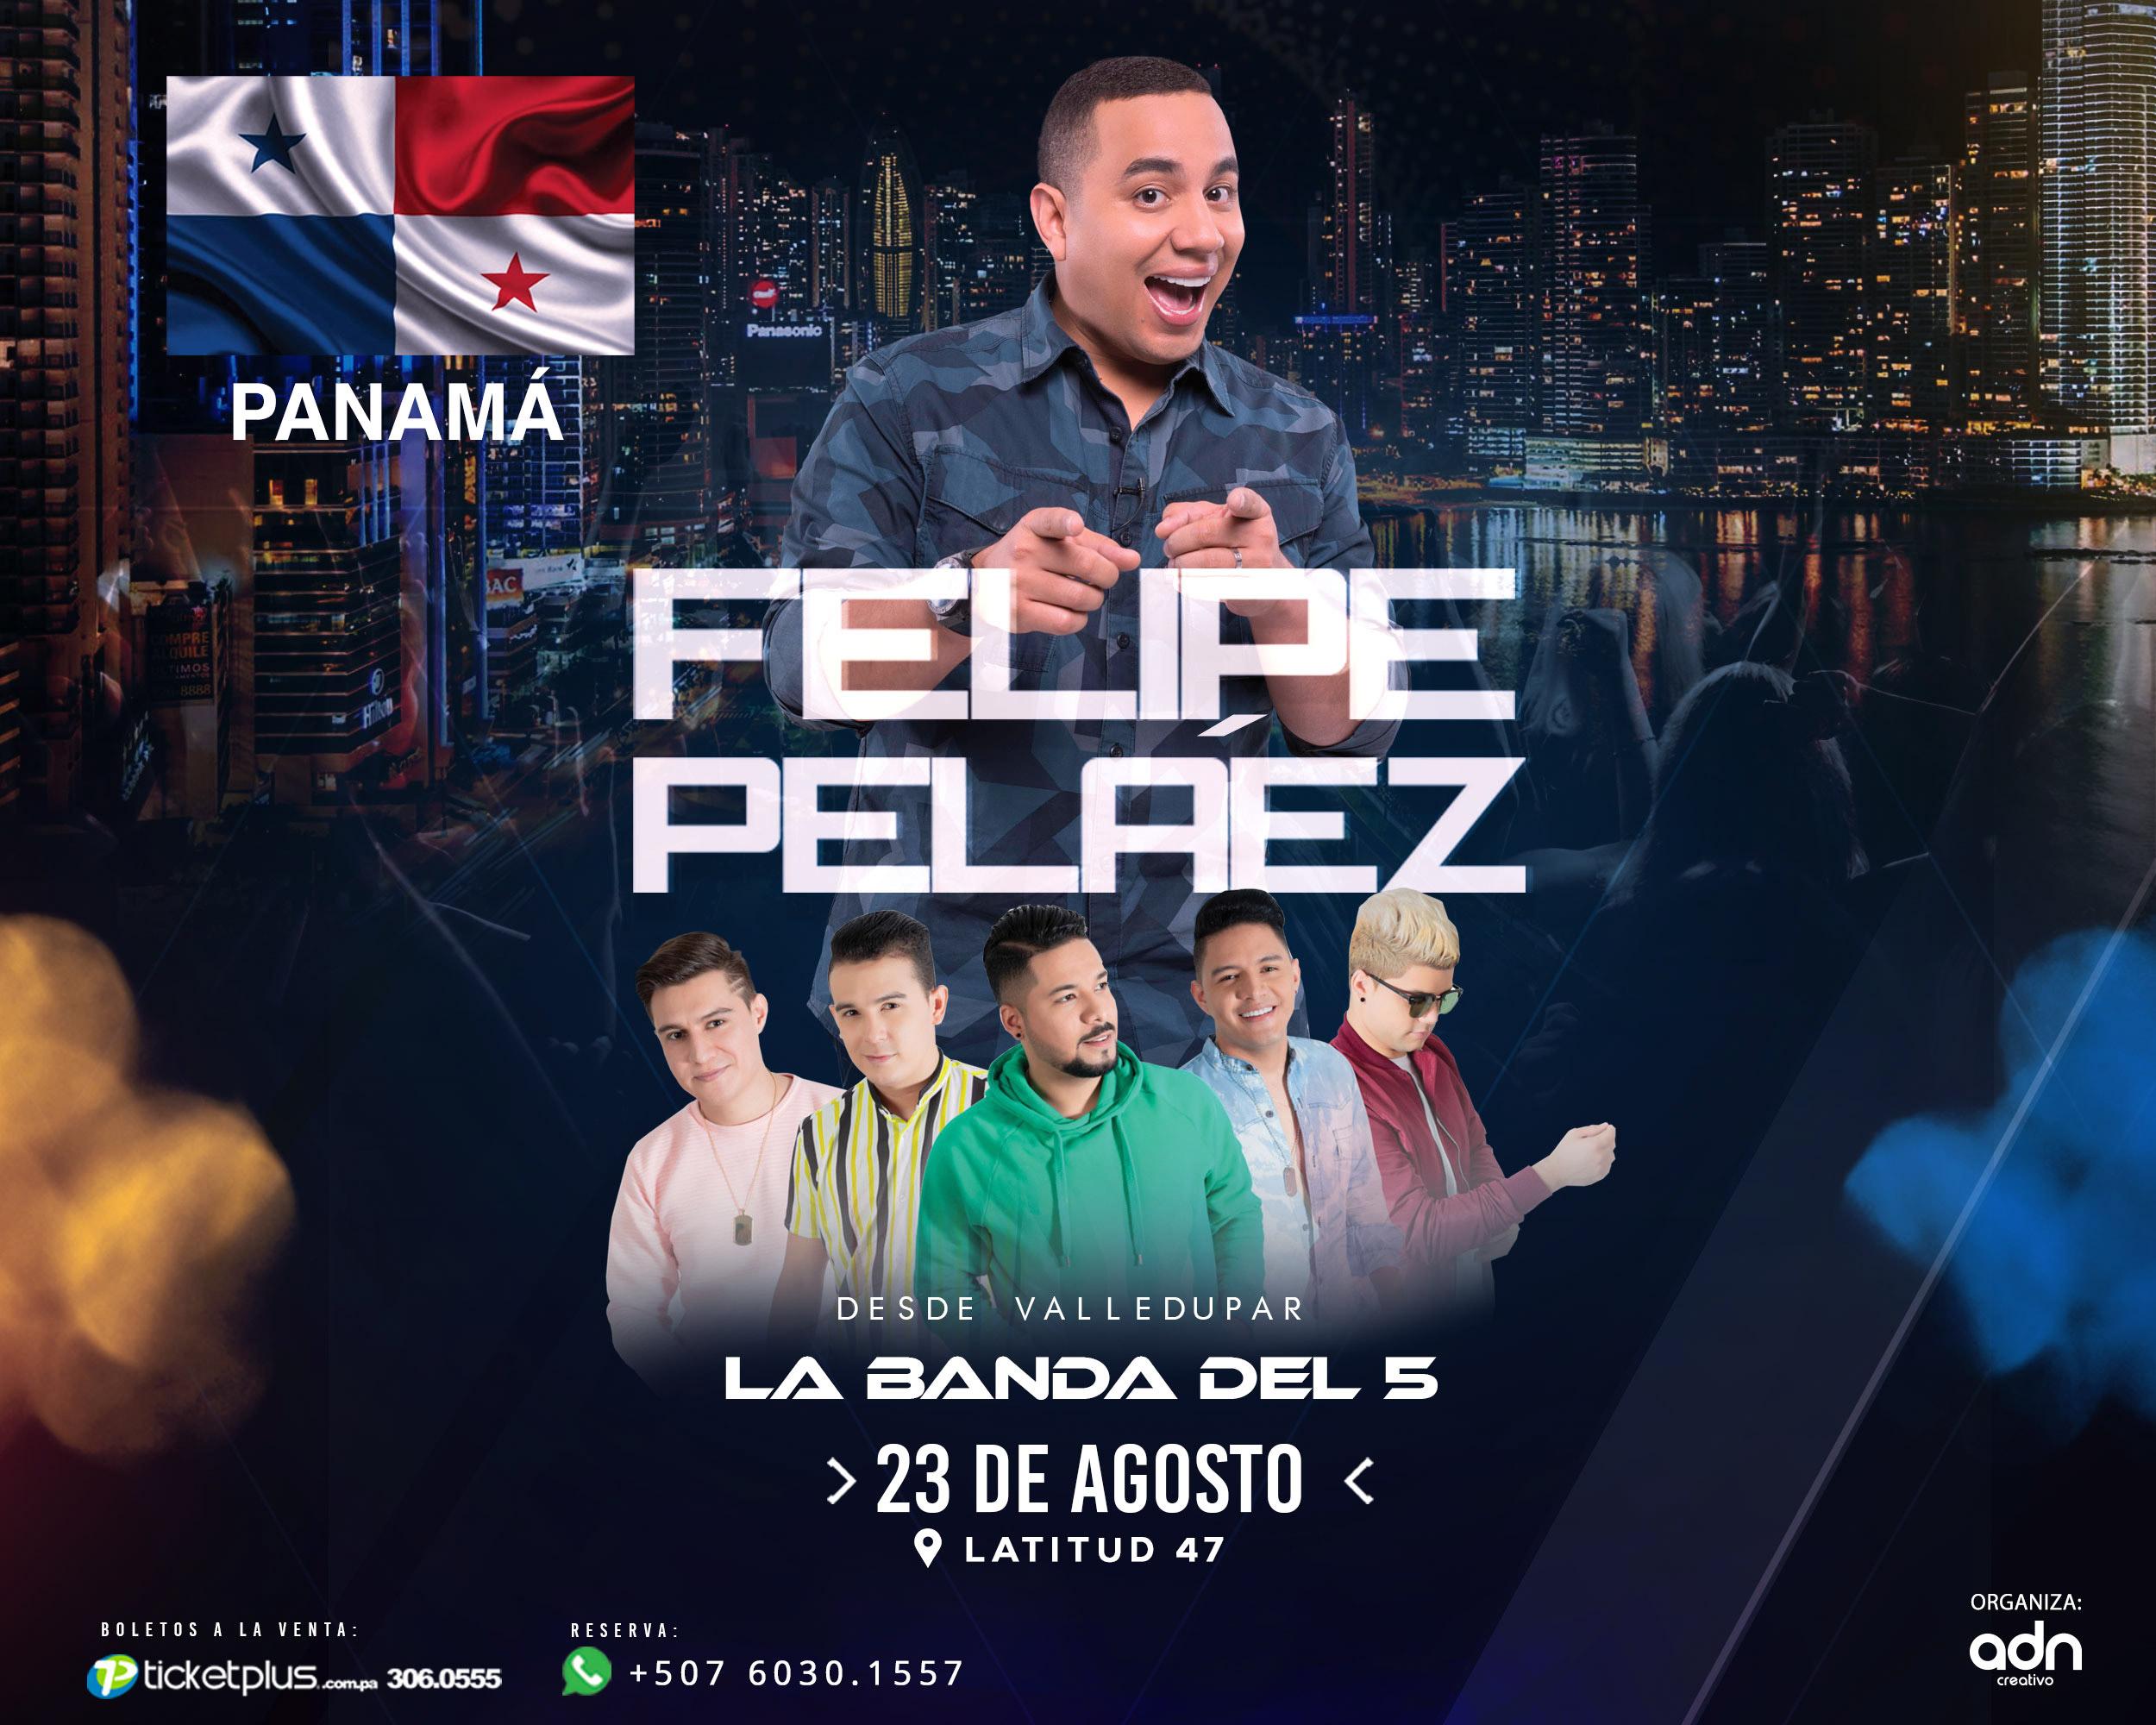 Photo of Felipe Peláez en concierto en Panamá